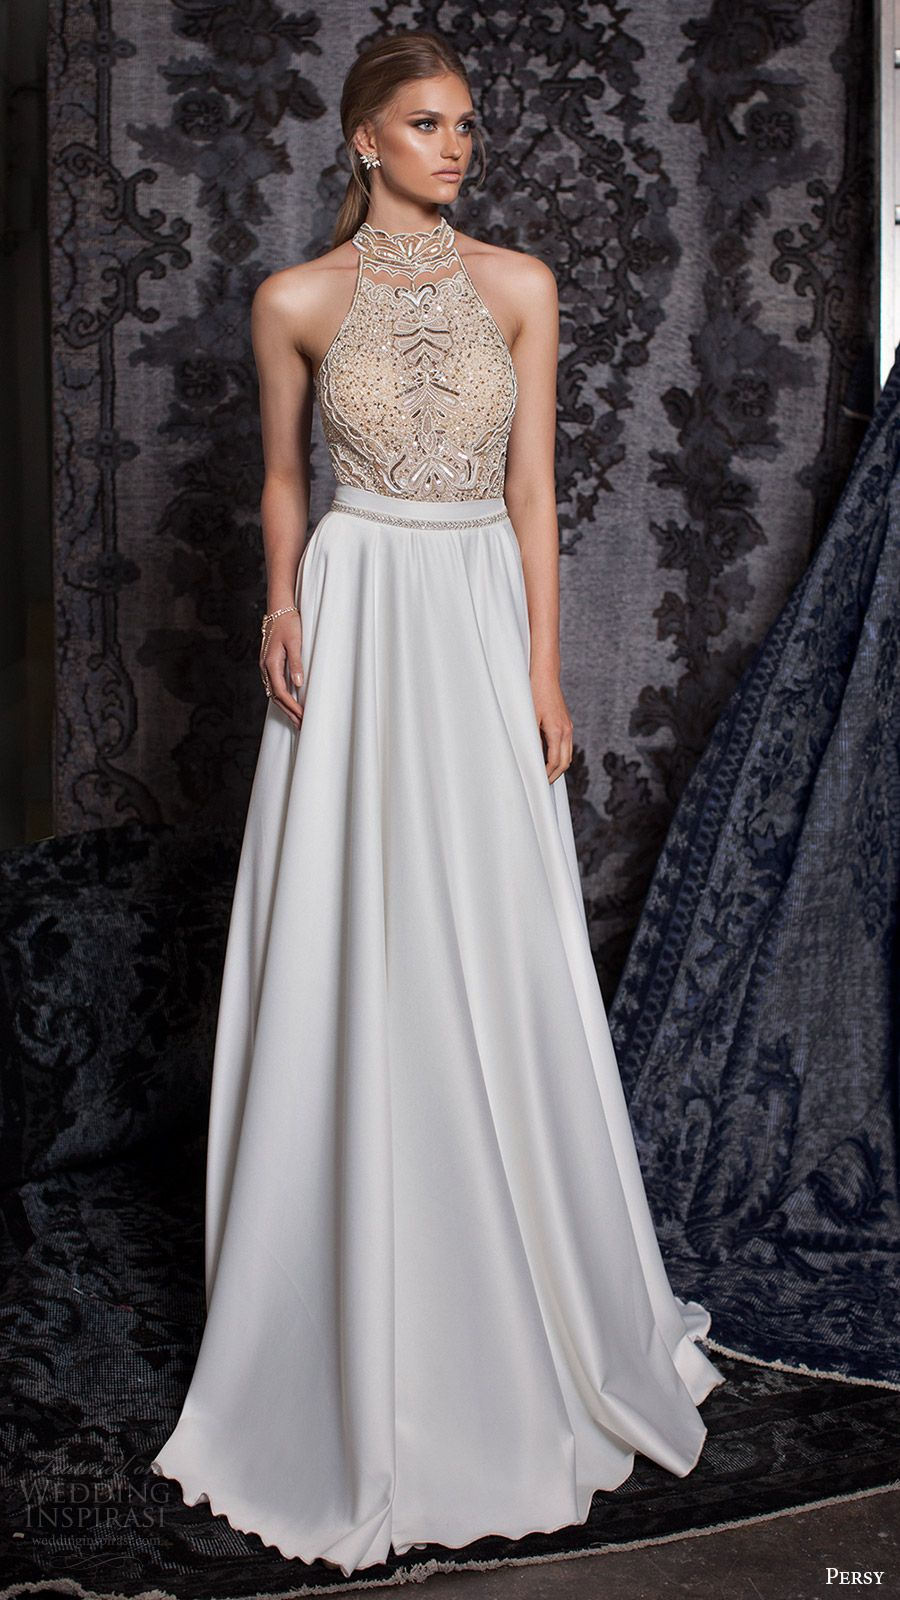 Persy fall wedding dresses u ucbohemian gypsyud bridal collection